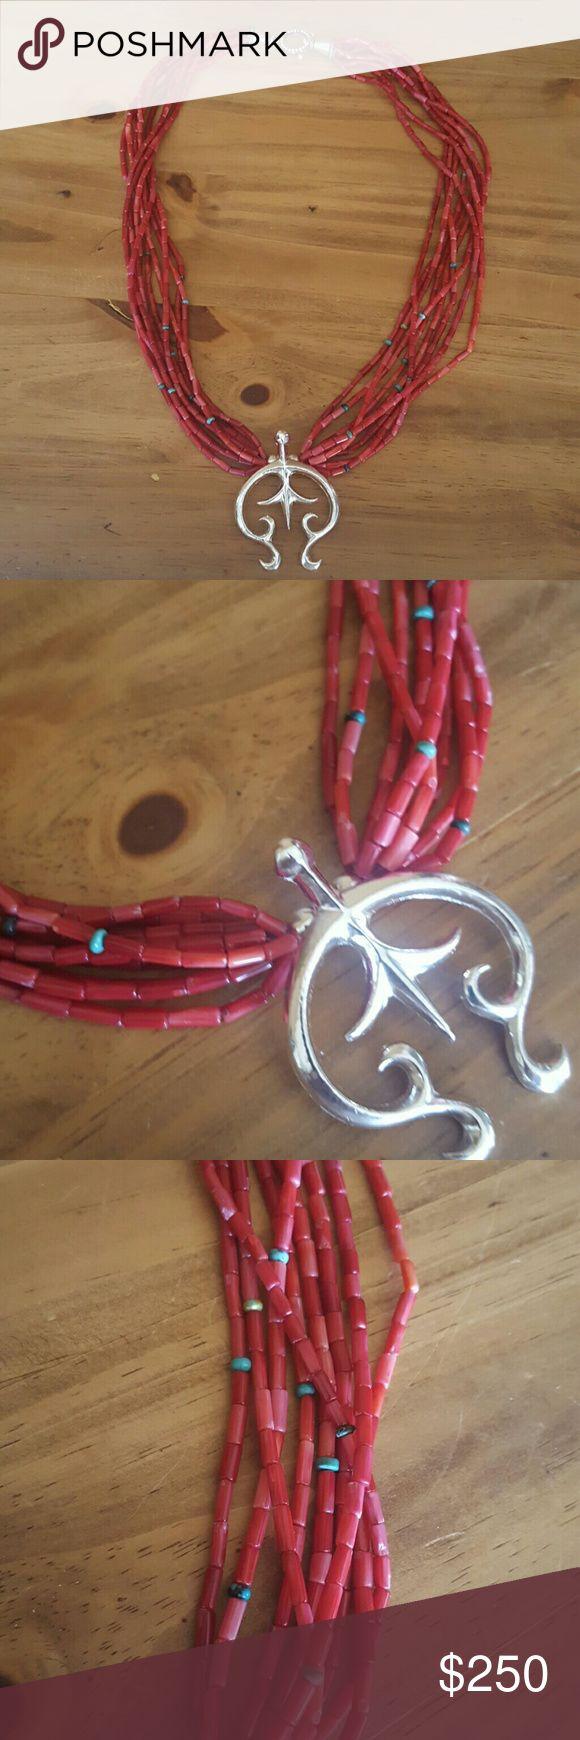 Navajo Multistrand Coral Naja Necklace Navajo coral turquoise and sterling naja necklace. Navajo Jewelry Necklaces